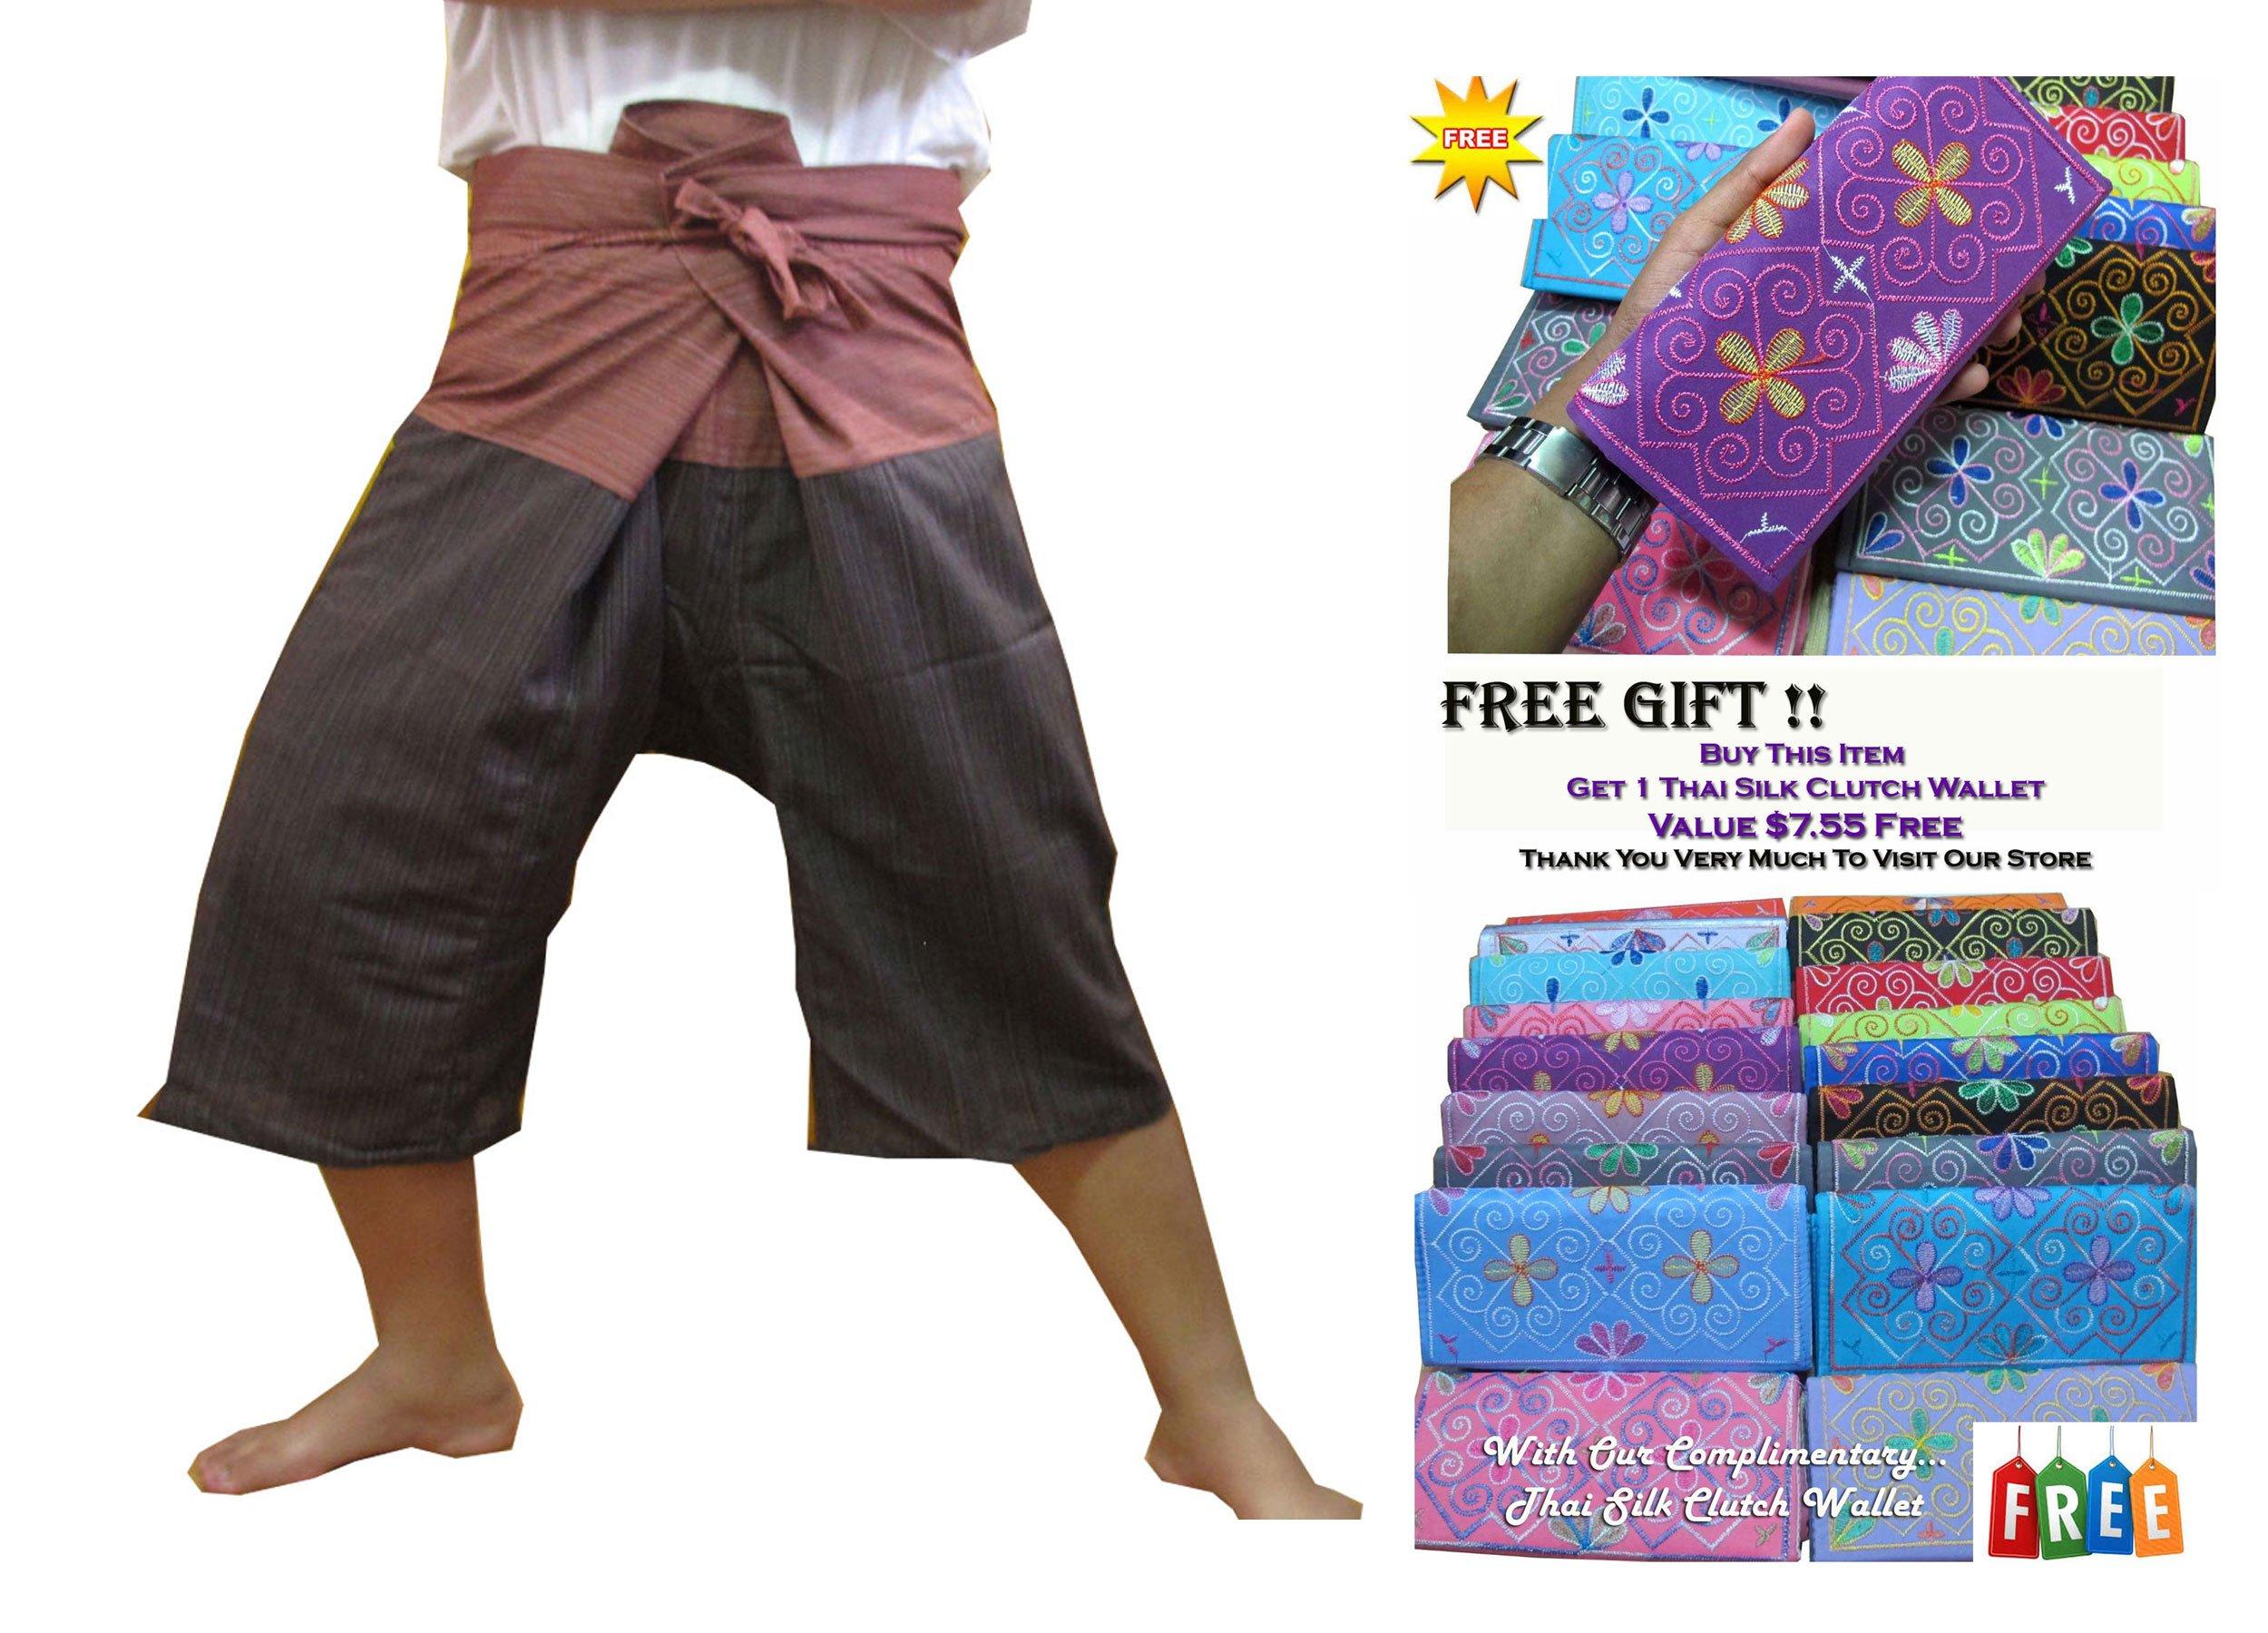 HITHOT SPORTY FOR YOU 2 TONE Thai Fisherman Pants 3/4 (32'' long) Mid-Calf Wrap Yoga